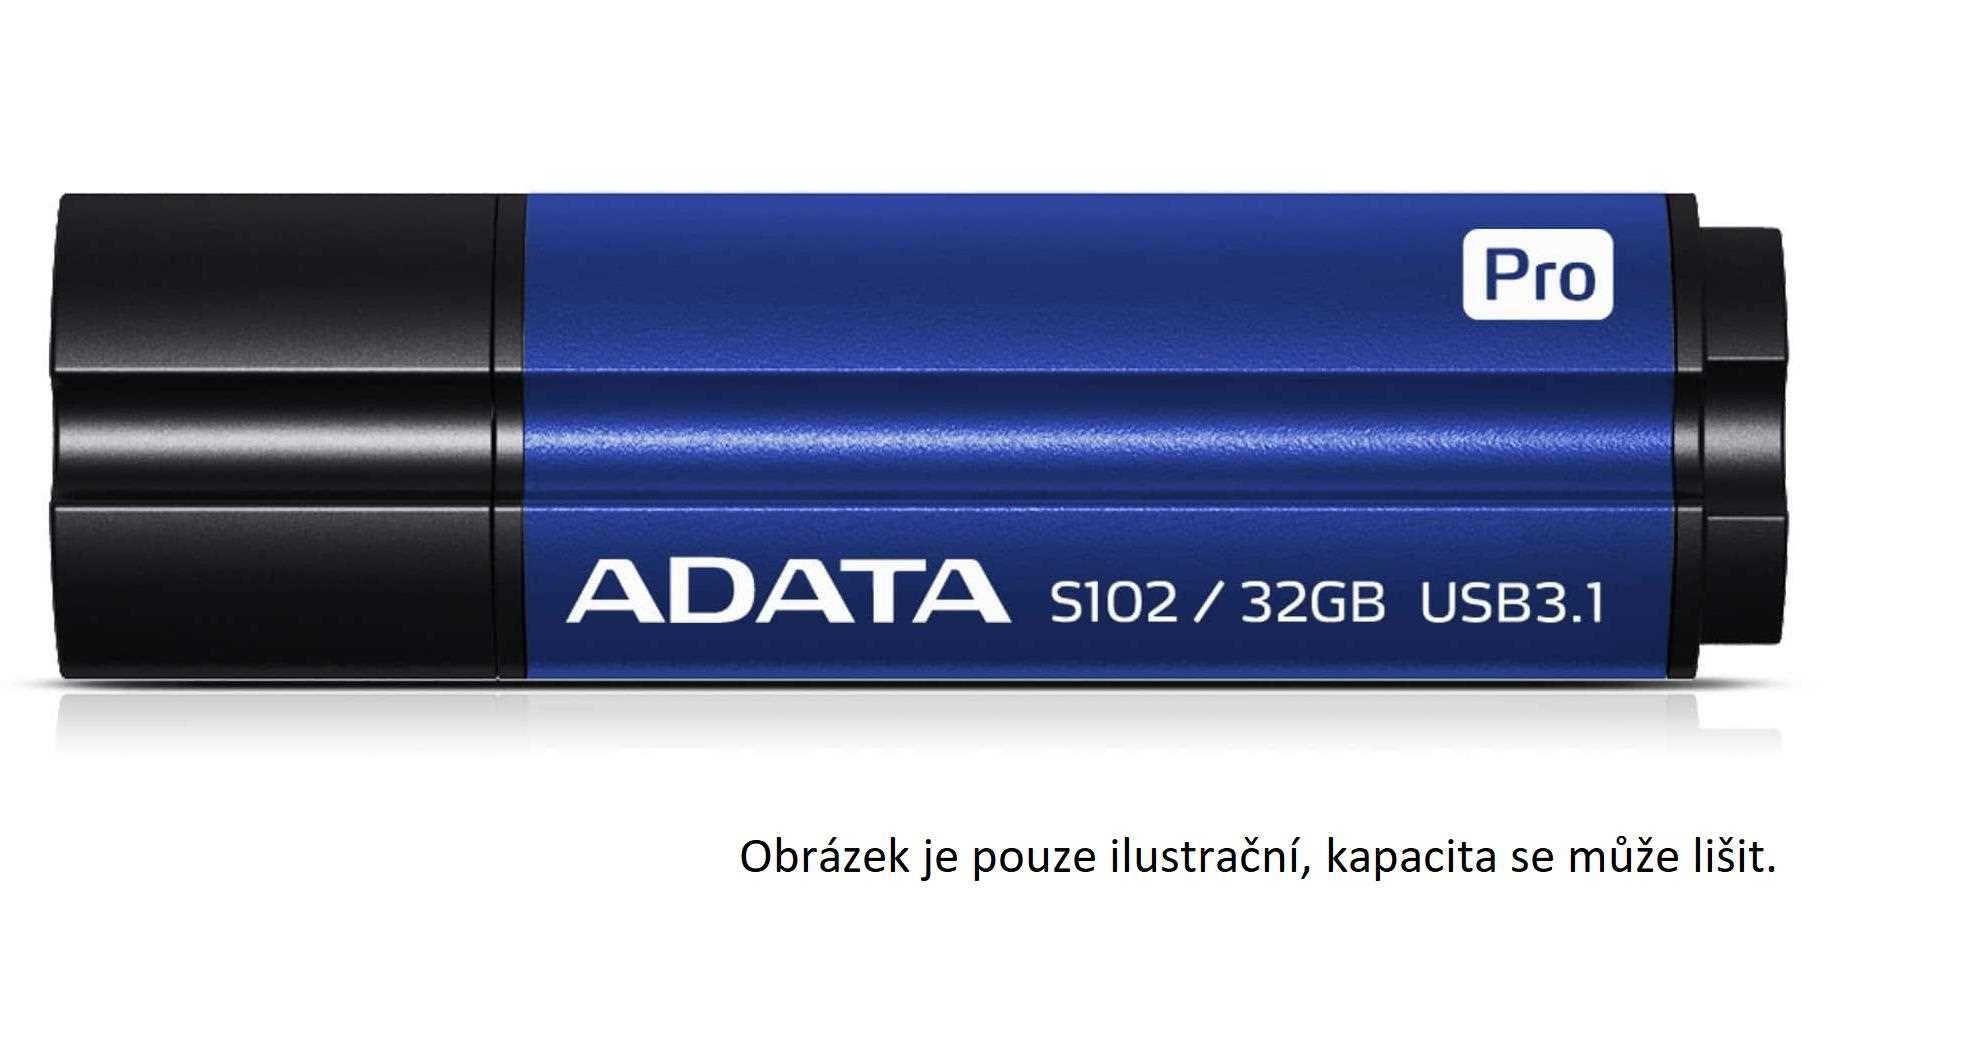 ADATA Flash Disk 128GB USB 3.0 Superior S102 Pro, hliníkový, modrý (R: 100MB / W: 50MB)